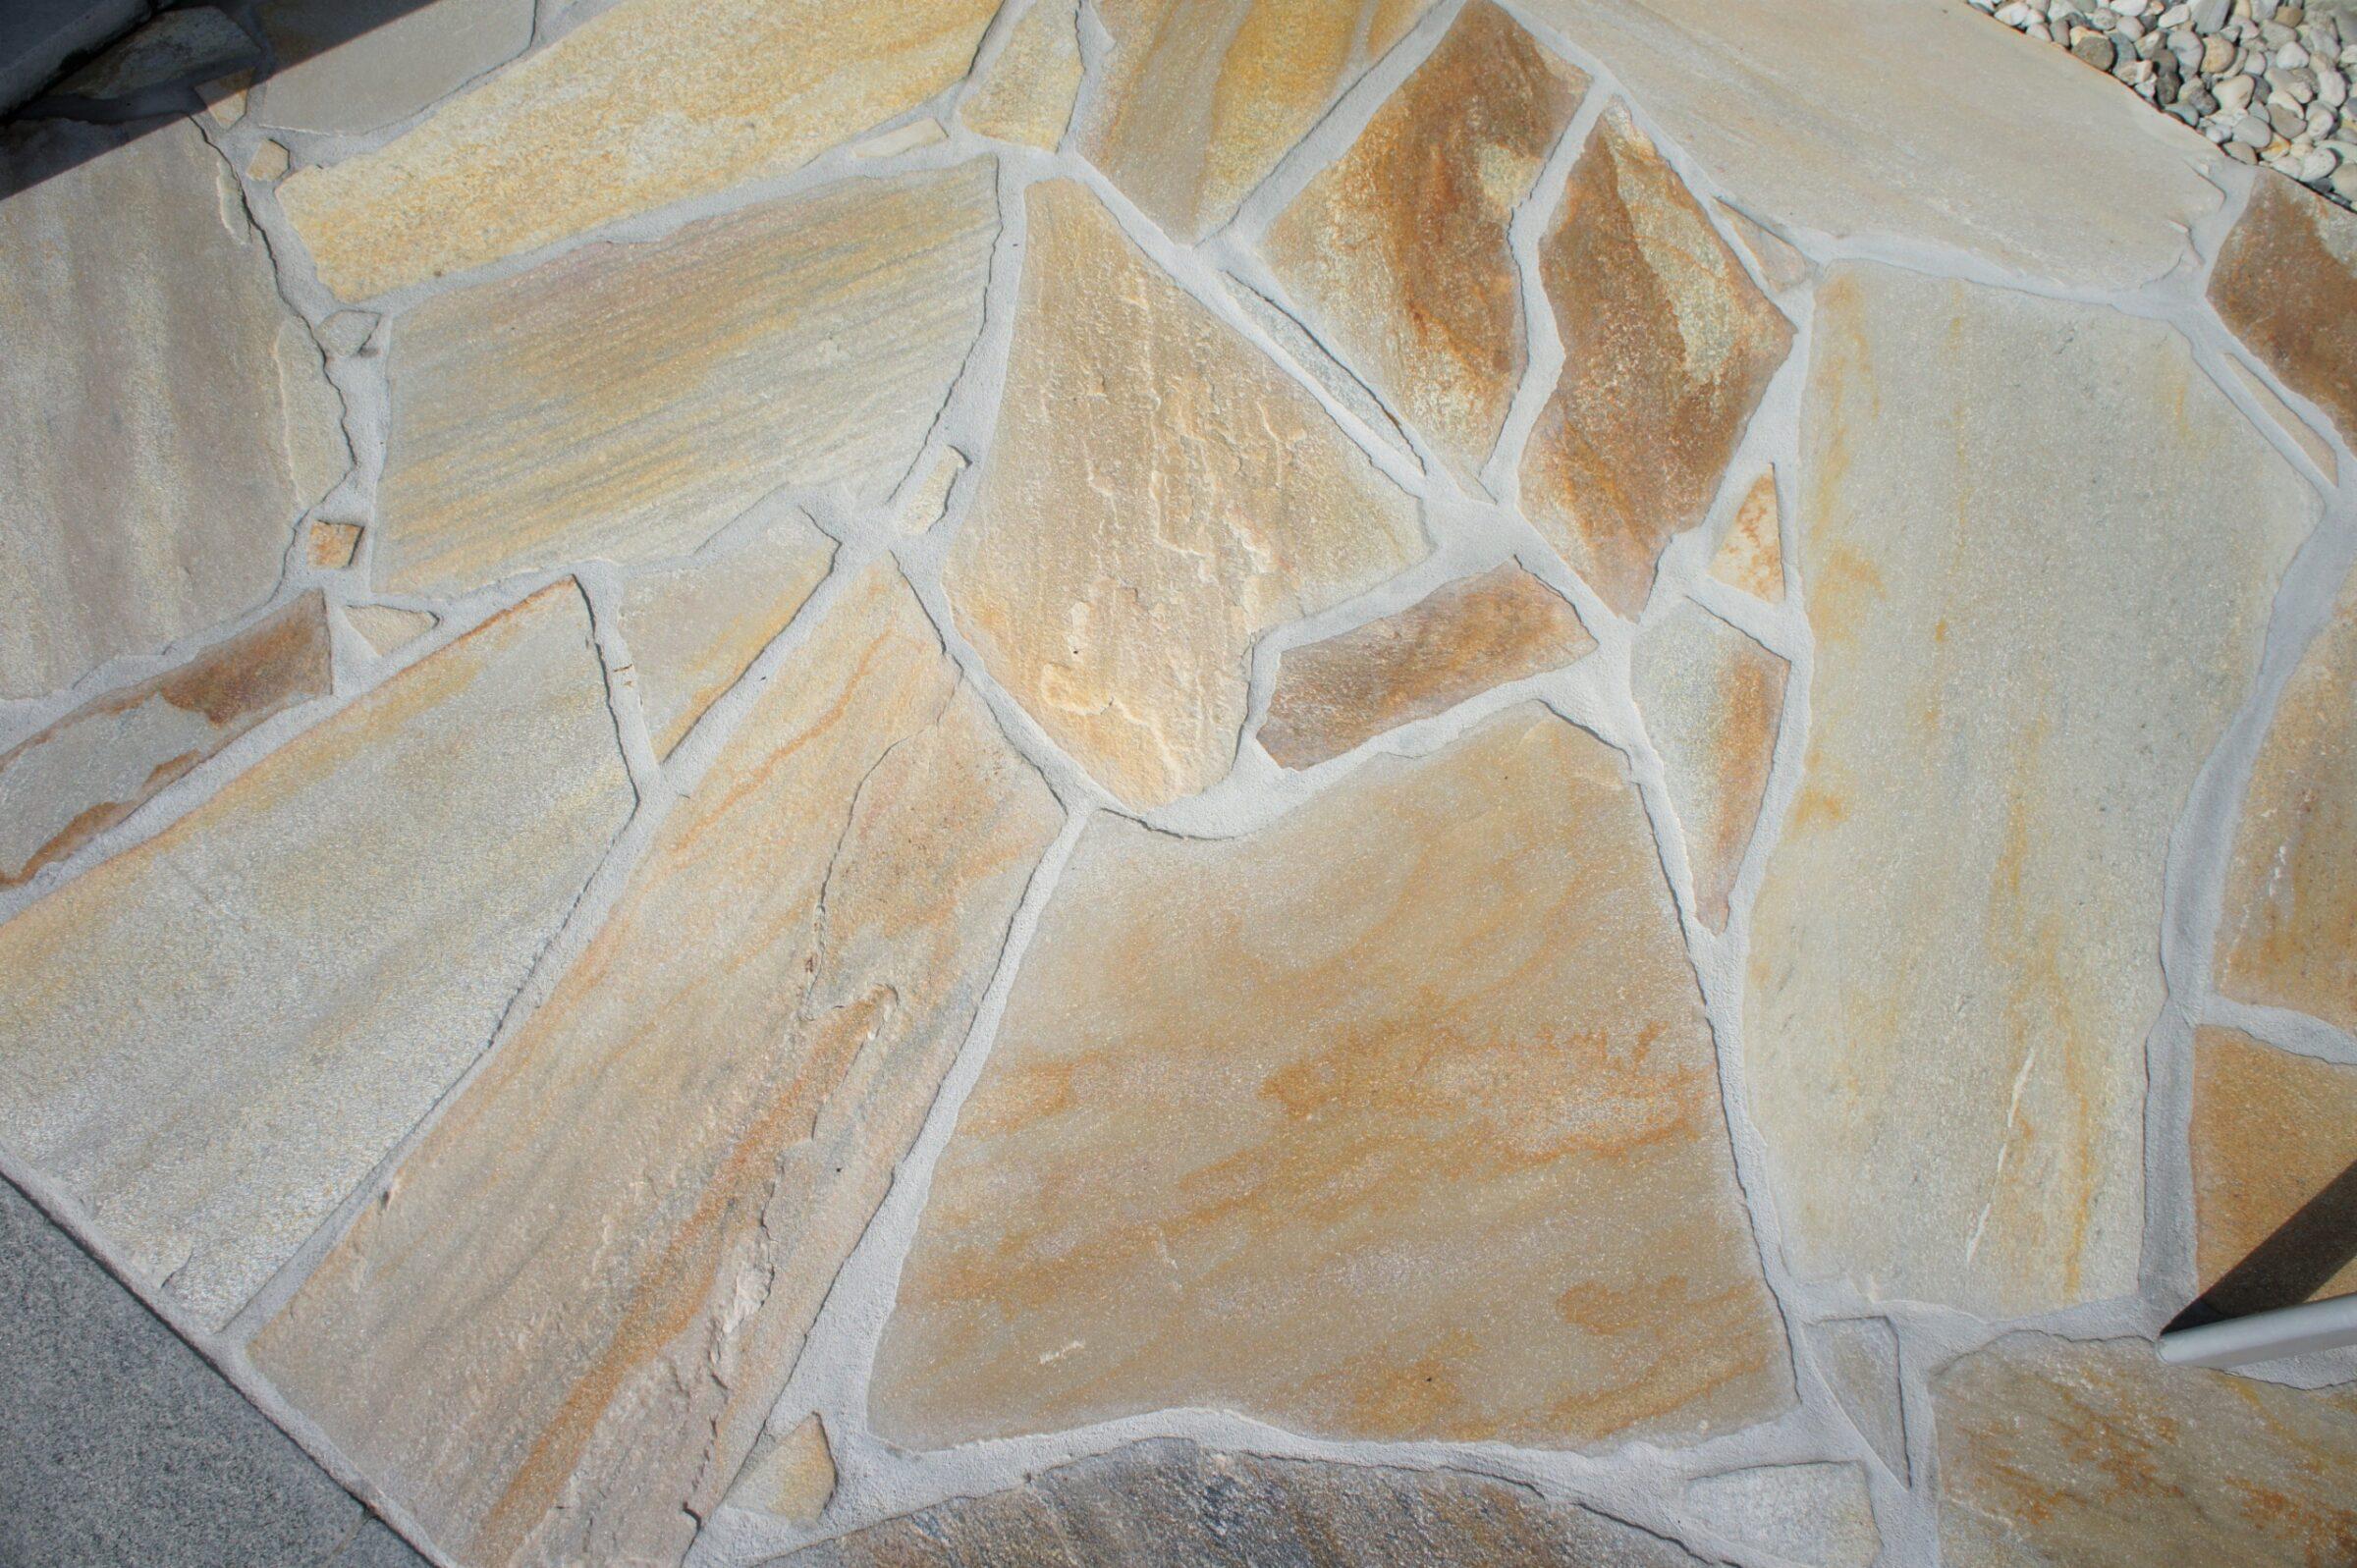 Brasil Yellow Flagstones kleur geel met ARDEX GK voeg zandbeige